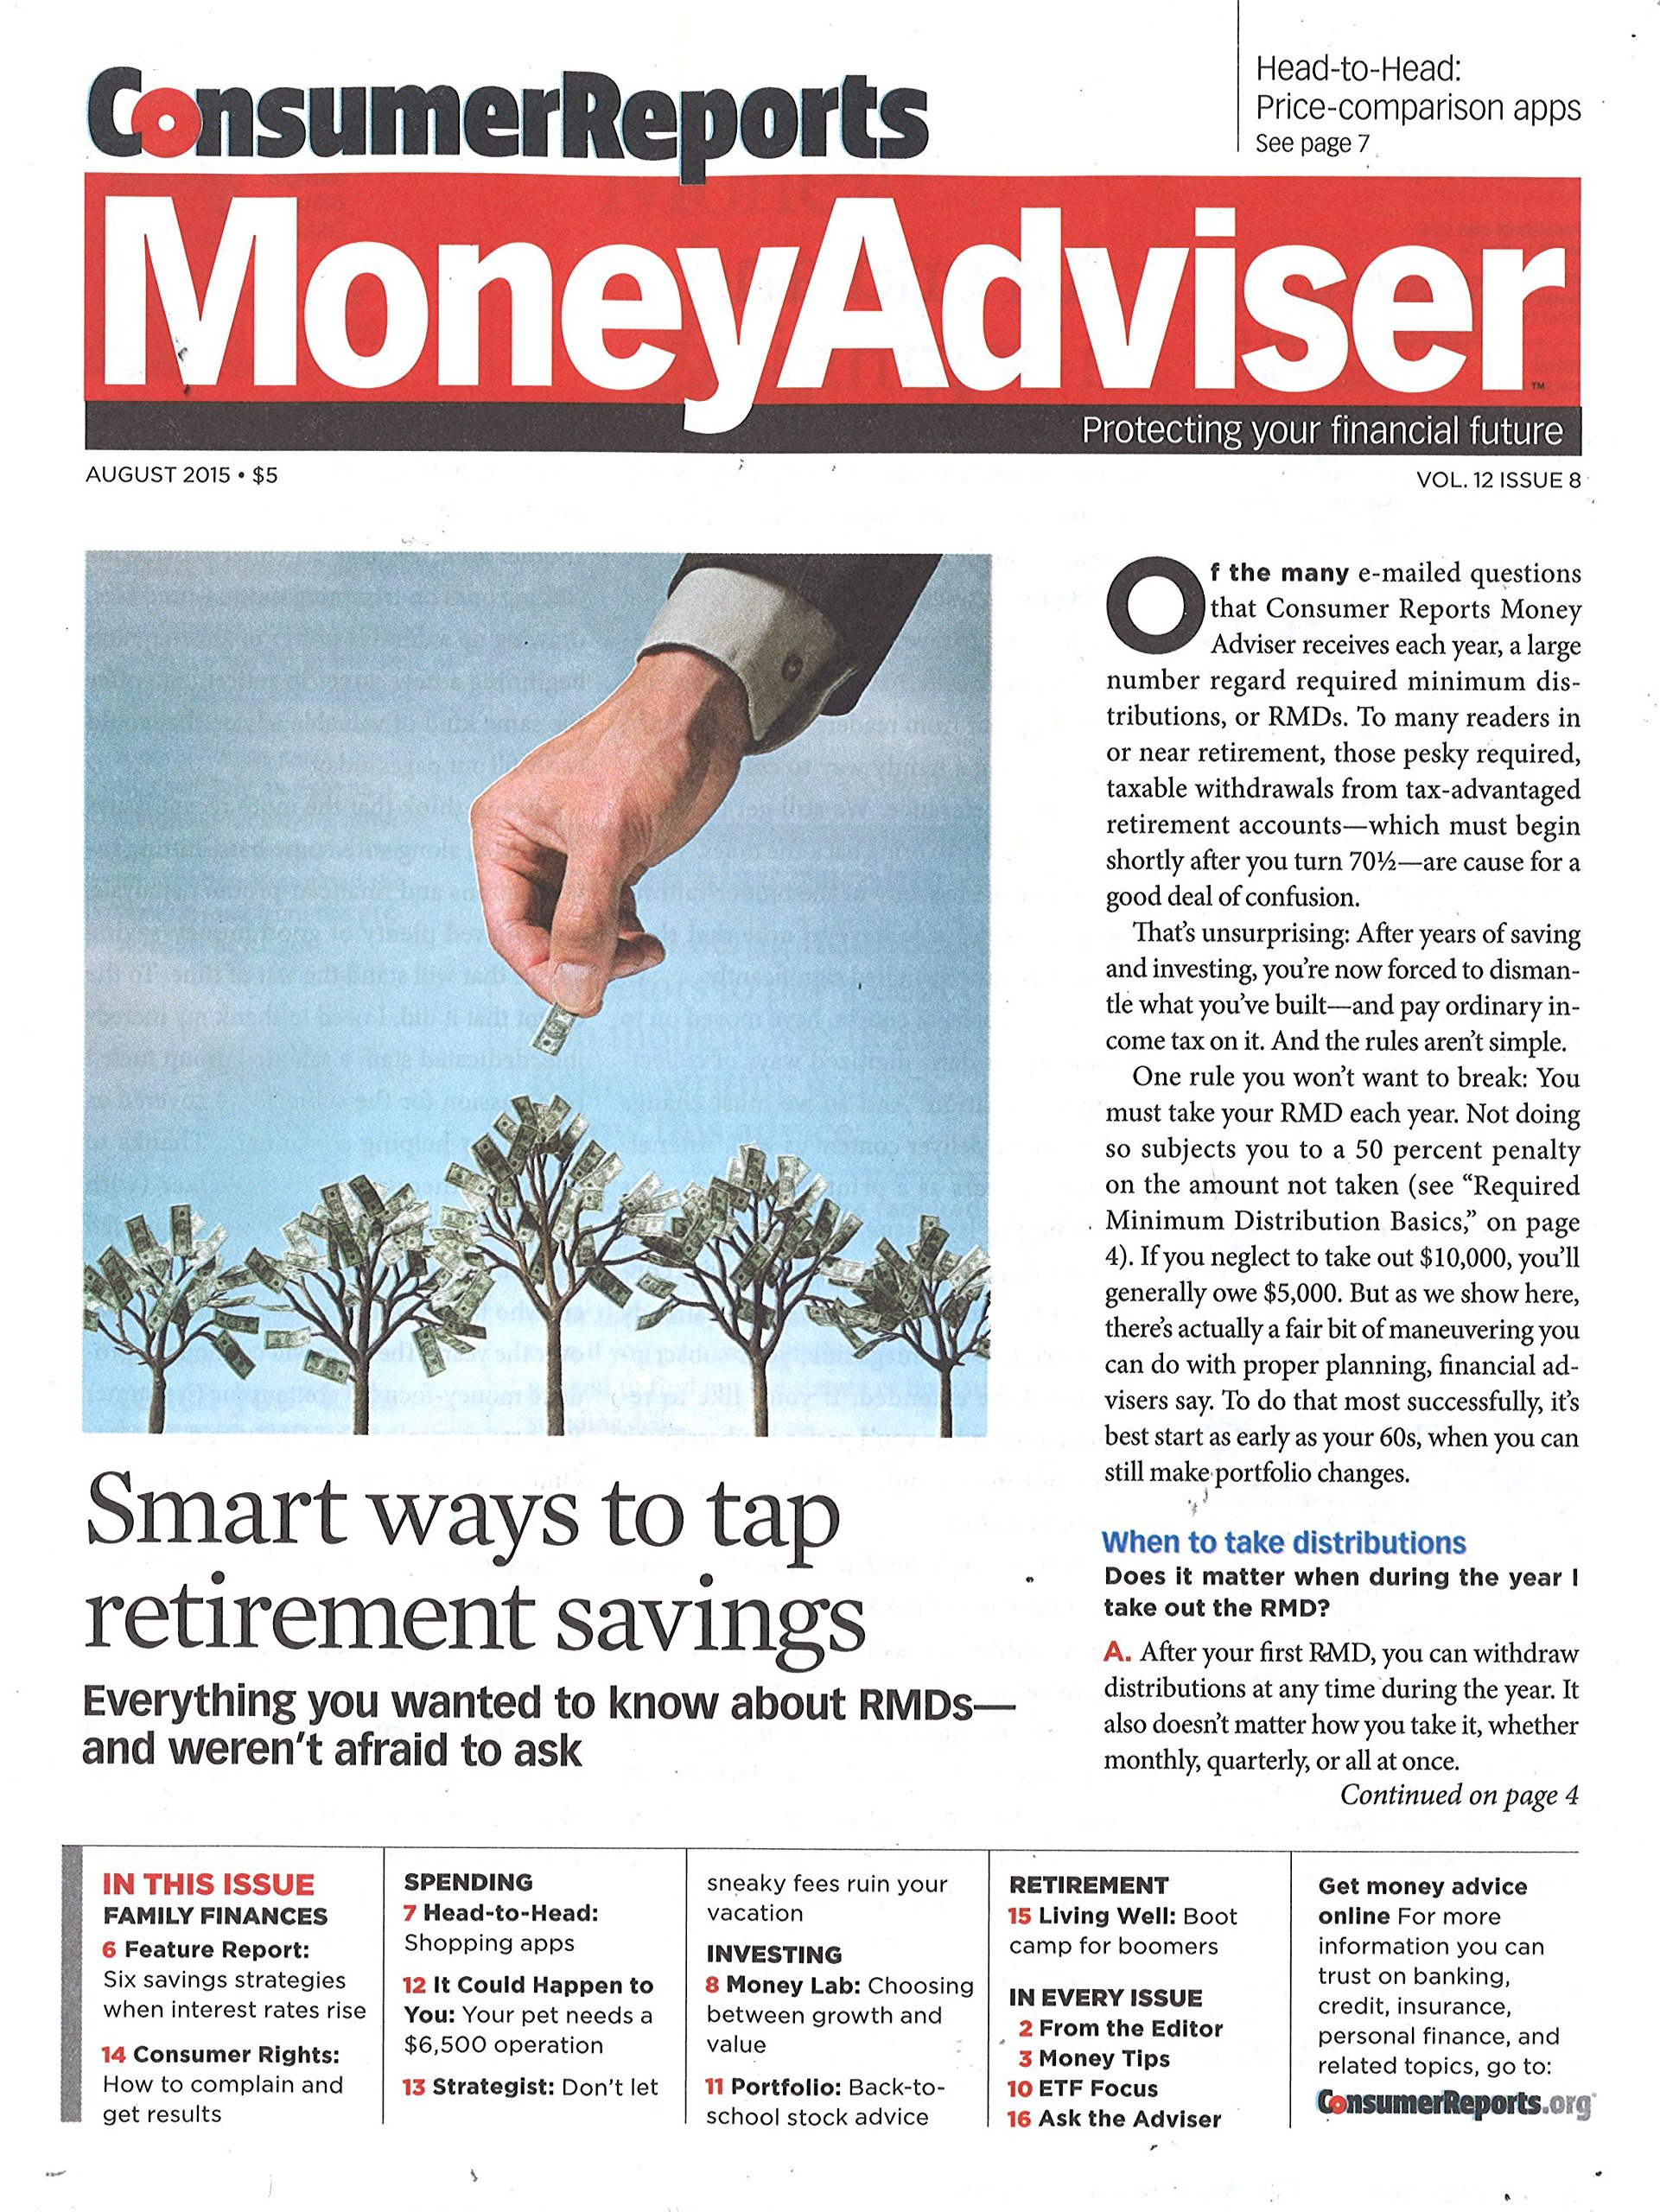 Consumer Reports Money Adviser